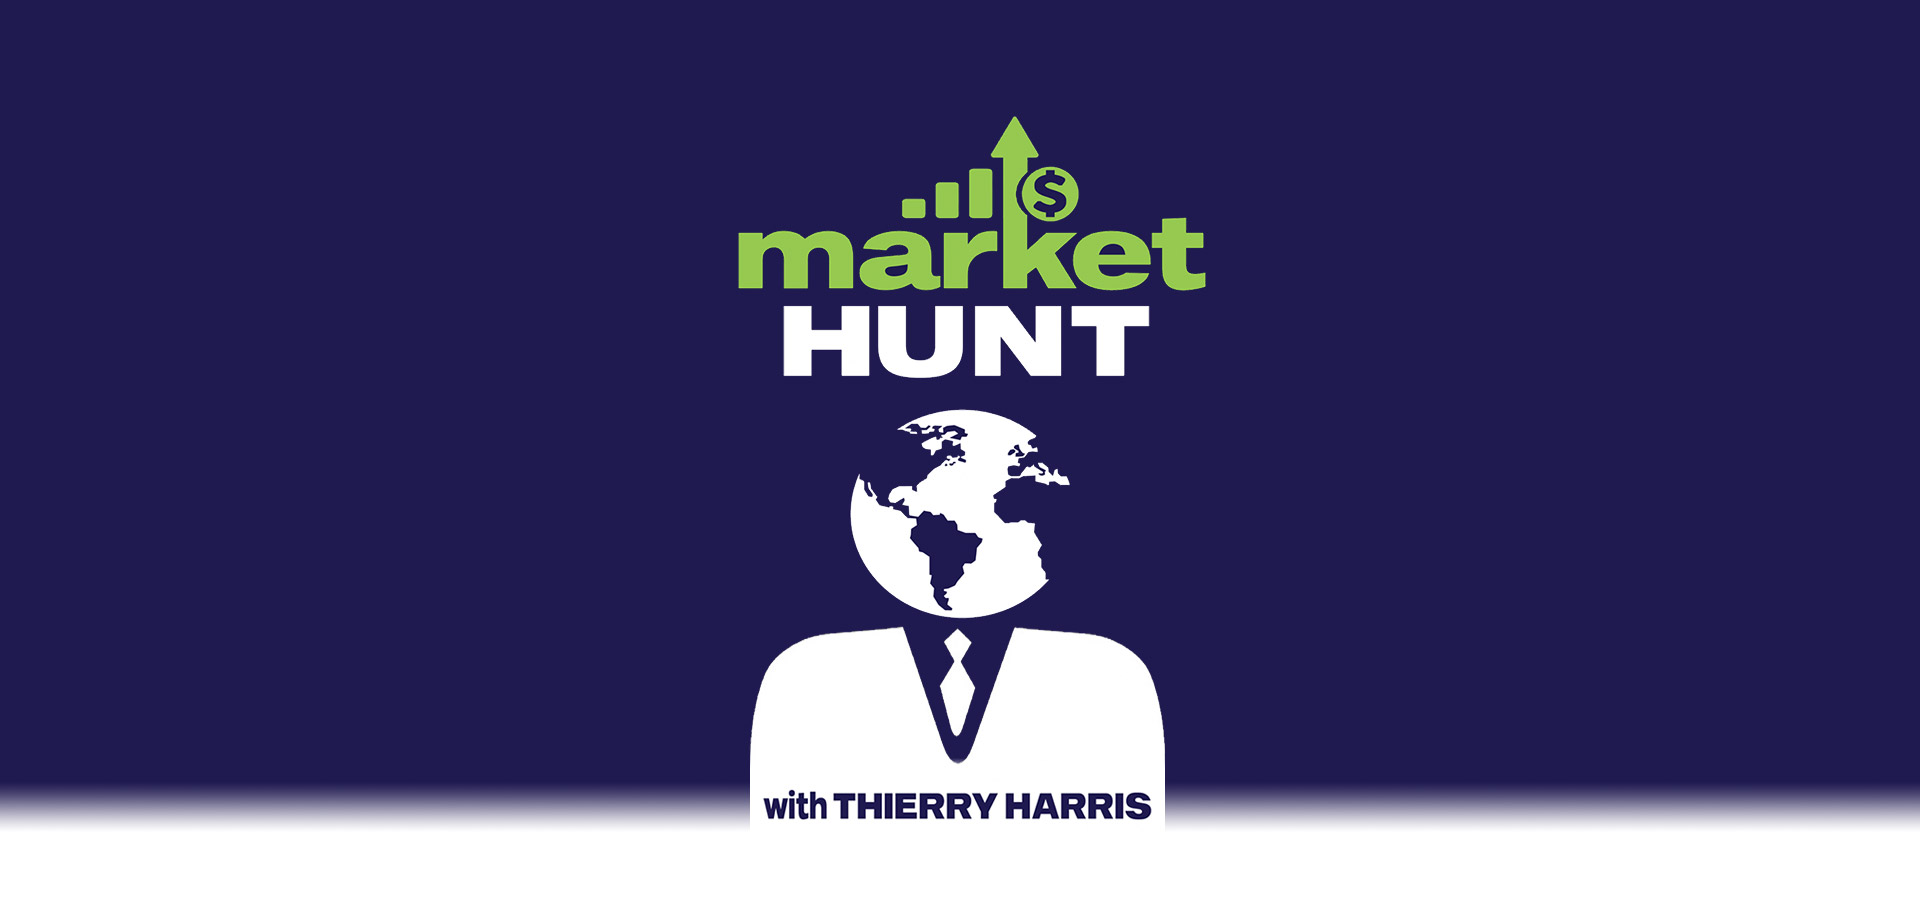 market-hunt-thierry-harris